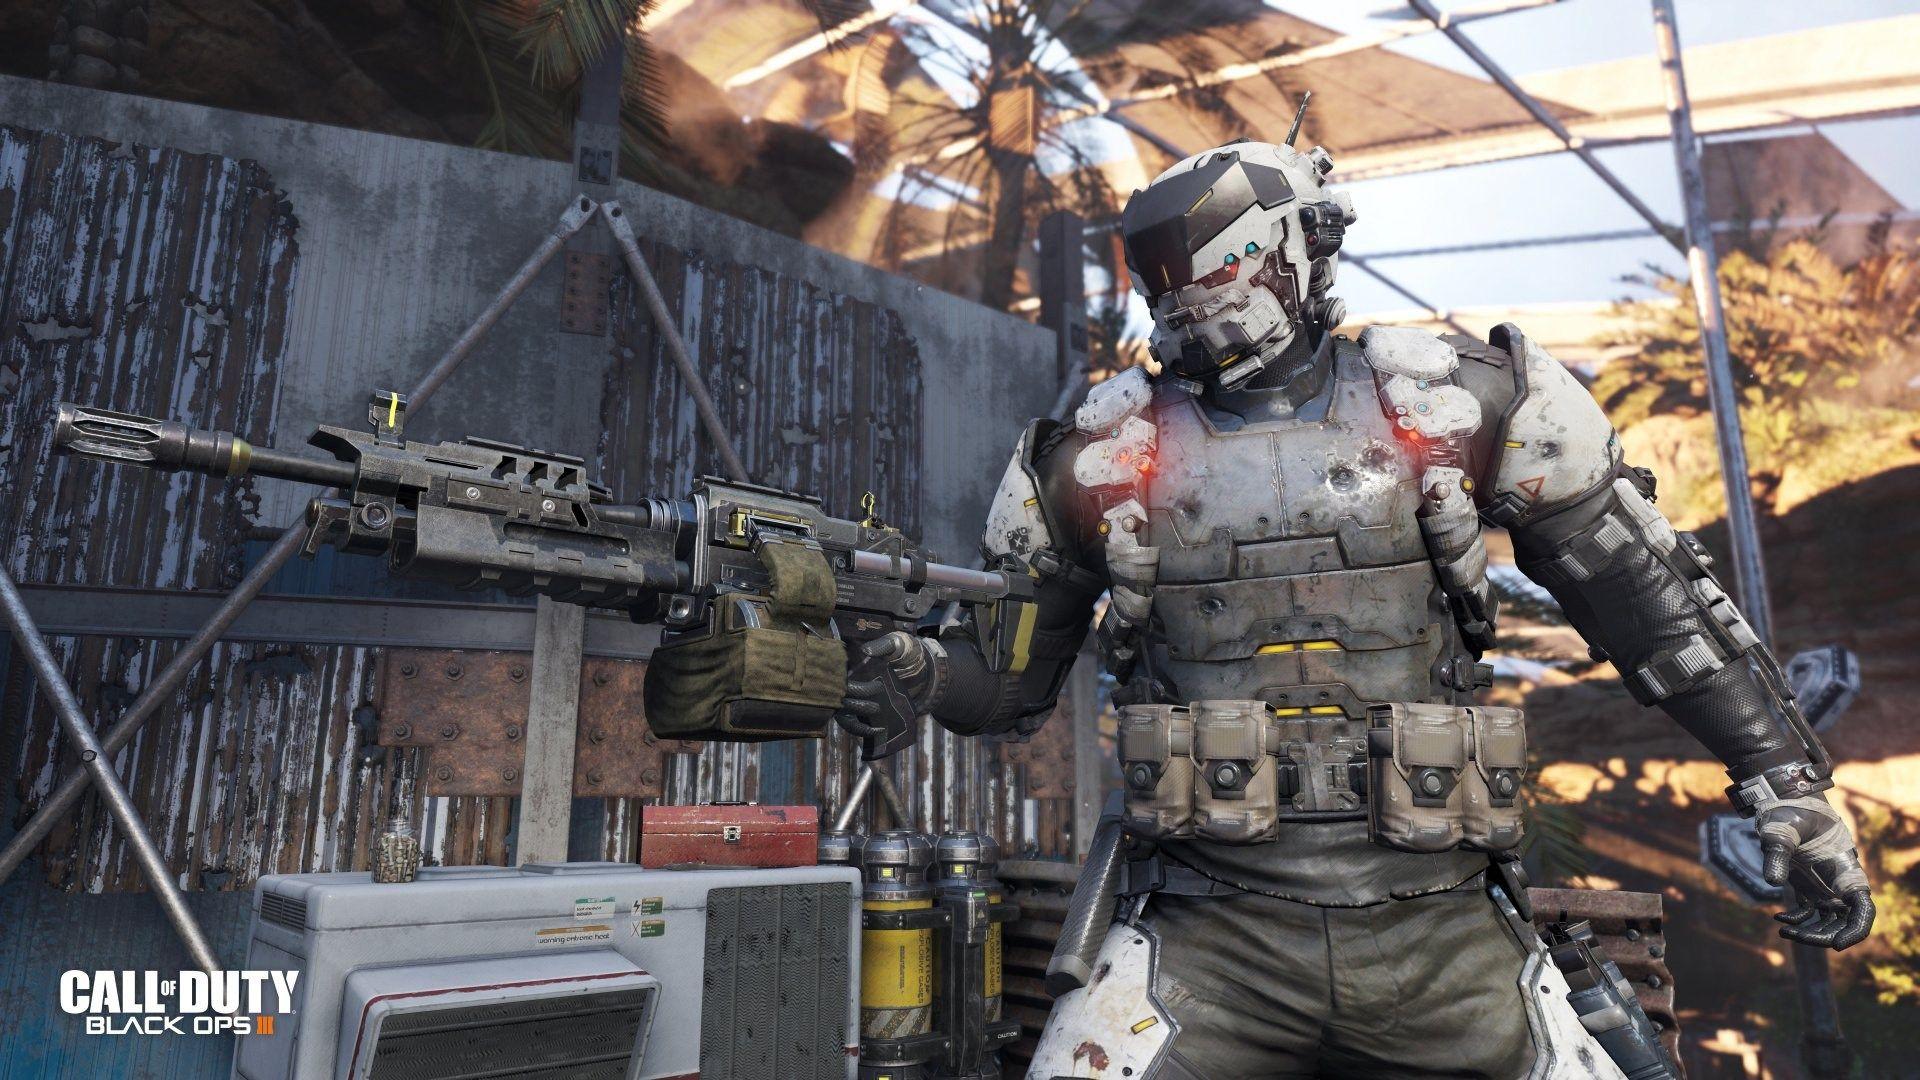 Call Of Duty Black Ops Iii Wallpaper 1080p Windows 443 KB